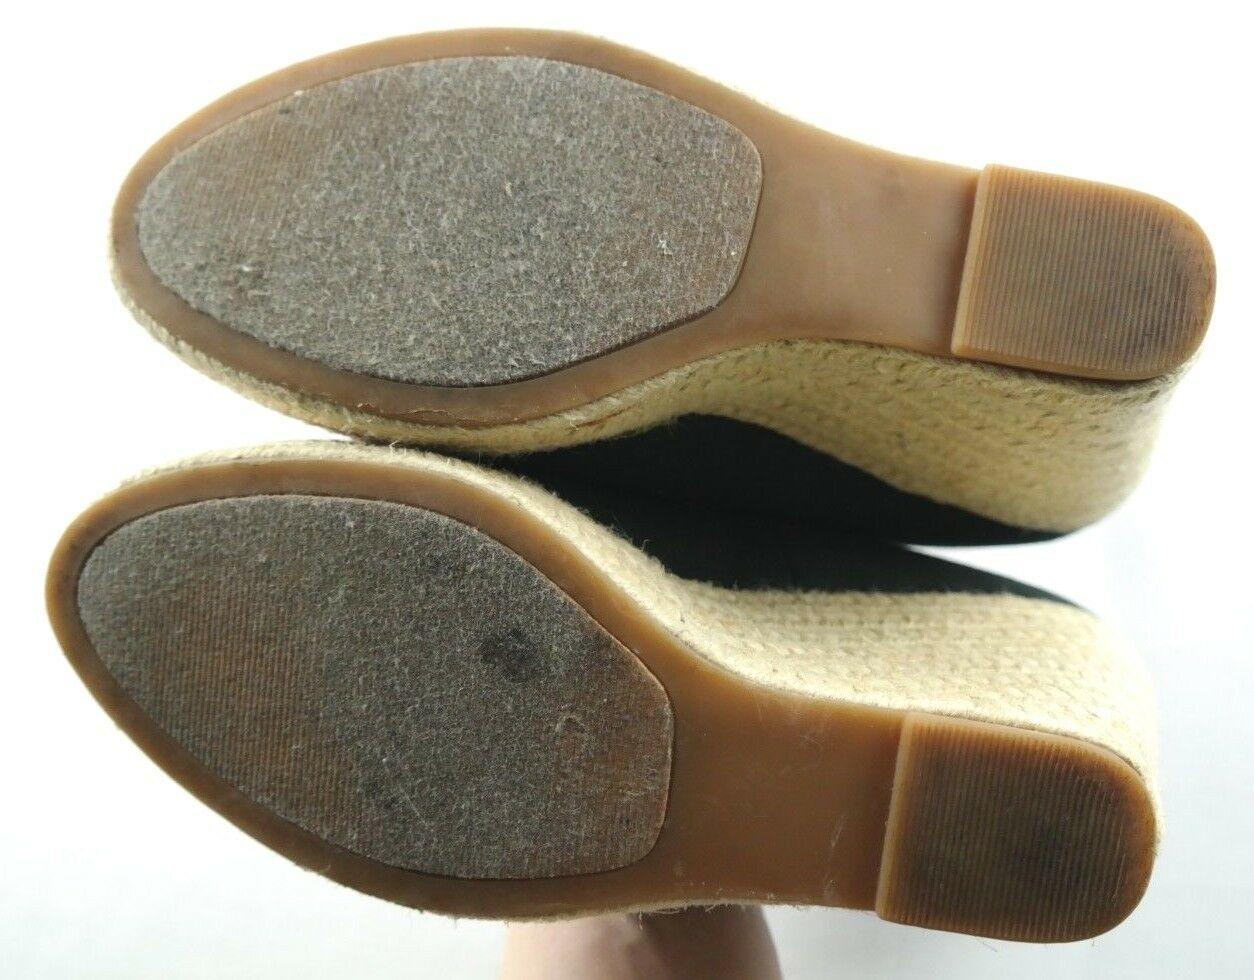 Steve Madden Peep Wedges Womens Size 6 Black Canvas Slip On High Heel Shoes image 8